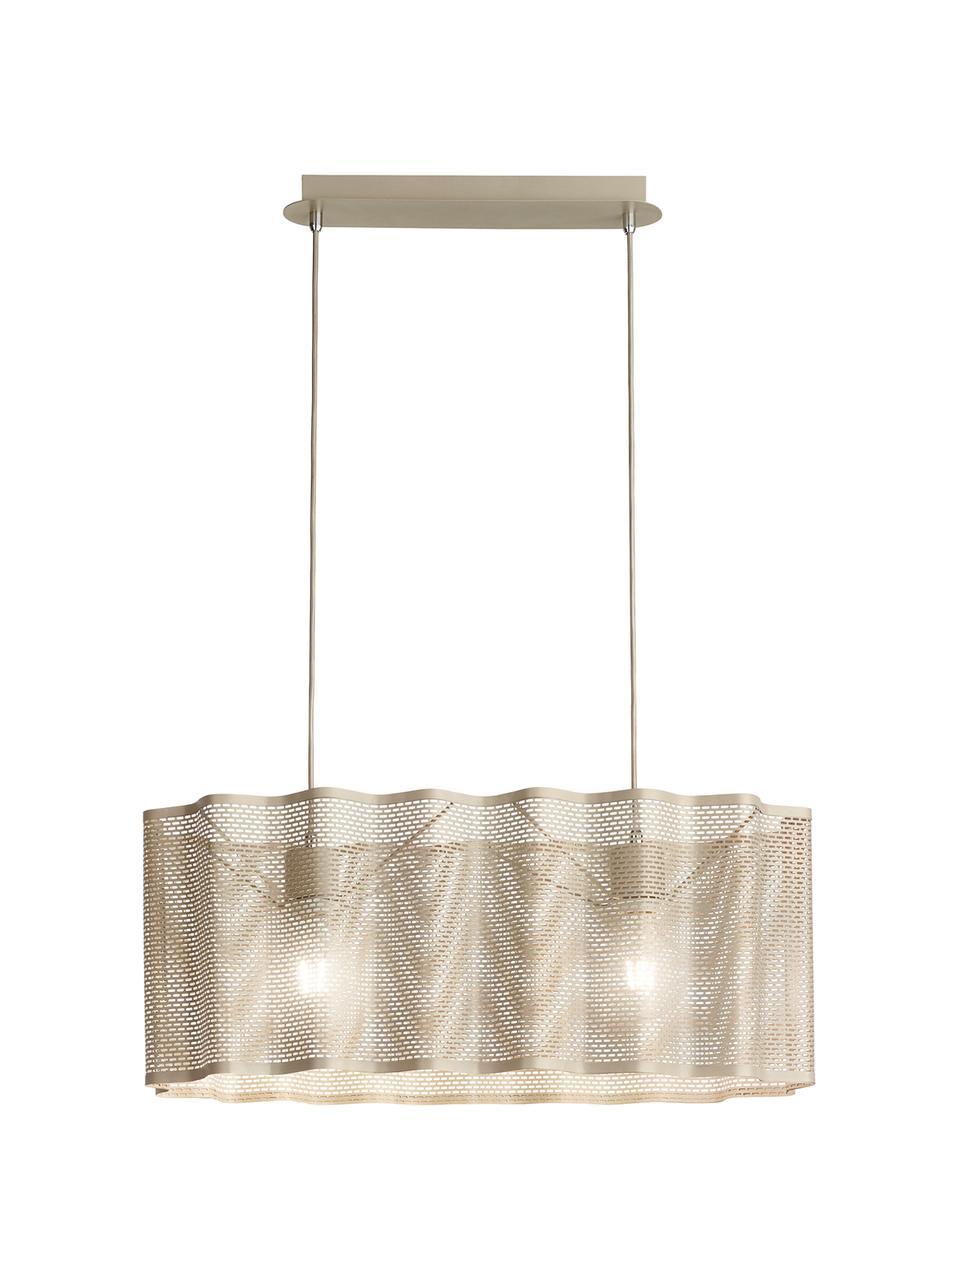 Ovale Pendelleuchte Glicine in Gold, Lampenschirm: Metall, beschichtet, Baldachin: Metall, beschichtet, Goldfarben, 70 x 28 cm